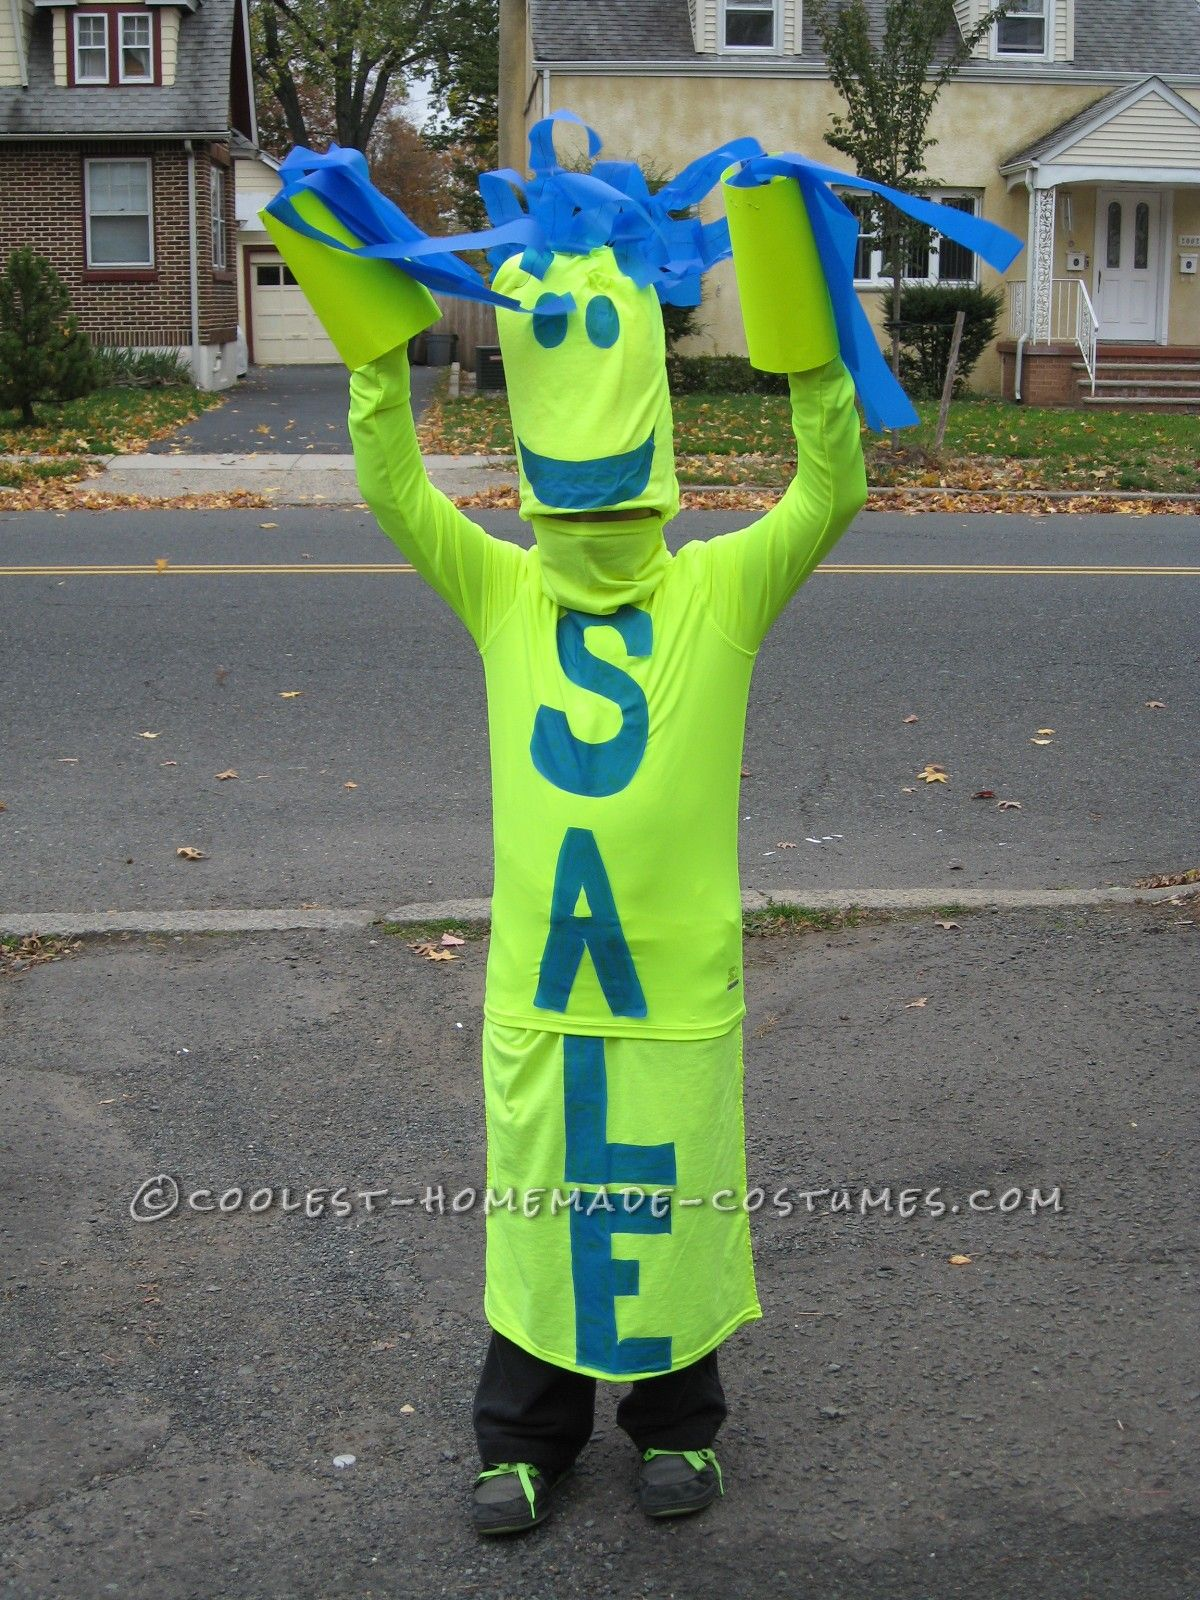 10 Year Old Halloween Costume Ideas Boys.Fun Diy Costume Idea Sky Dancer Sign Clever Halloween Costumes Crazy Halloween Costumes Clever Halloween